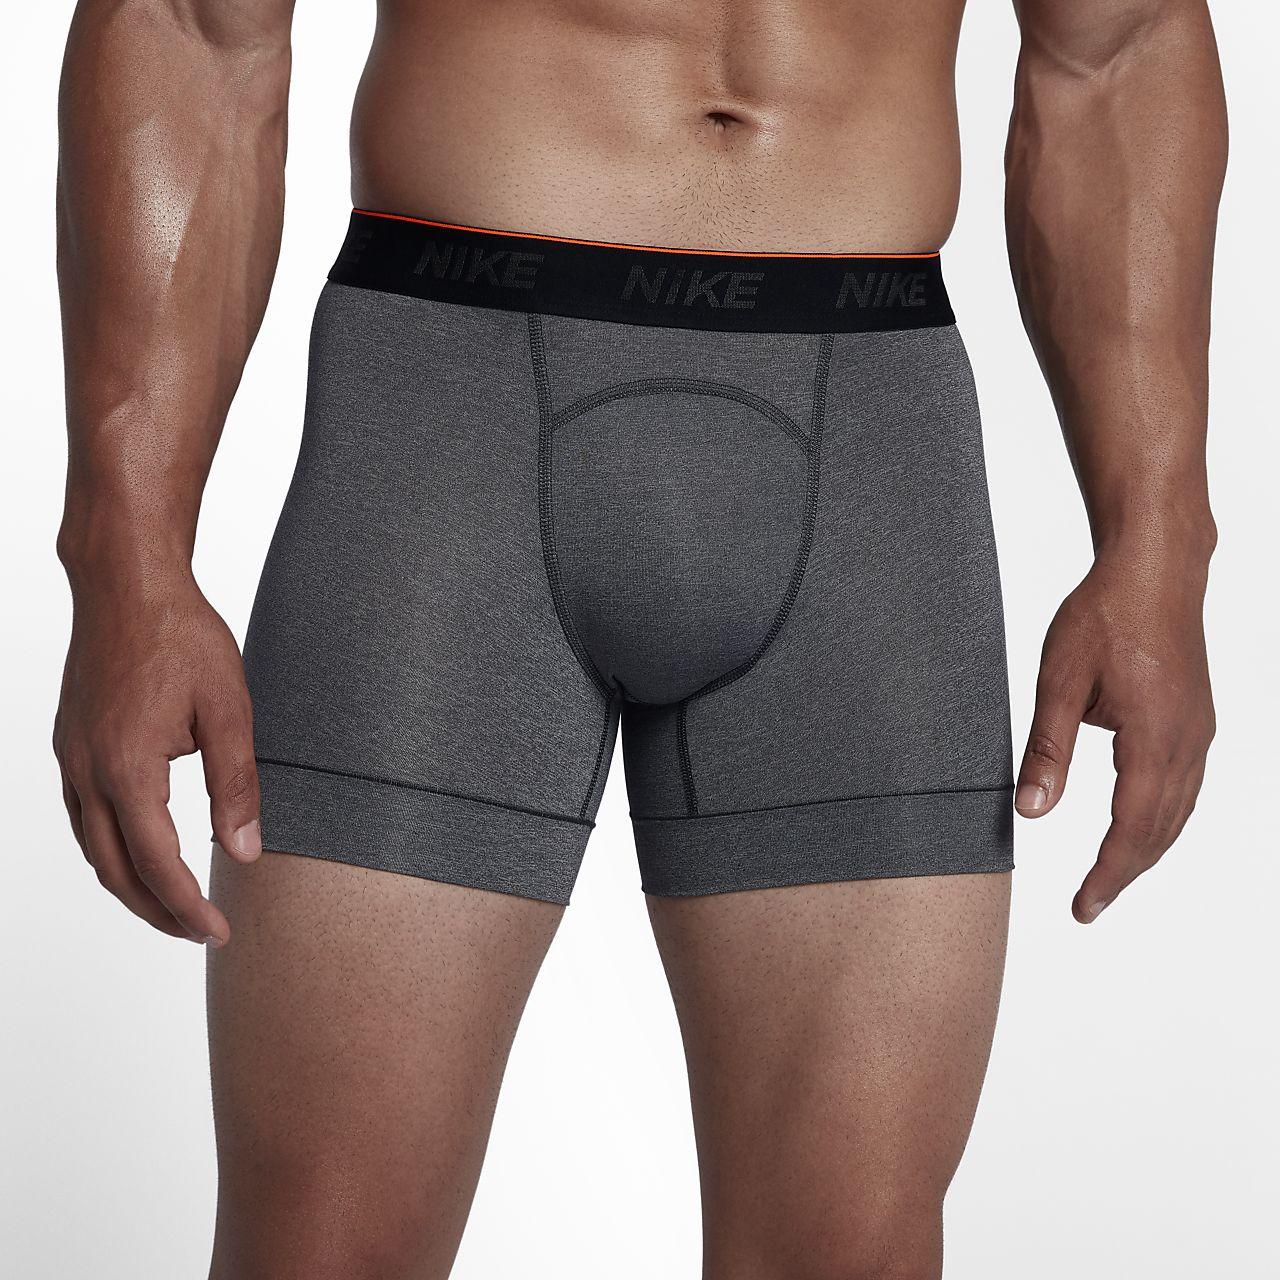 Nike Ropa interior (2 pares) - Hombre